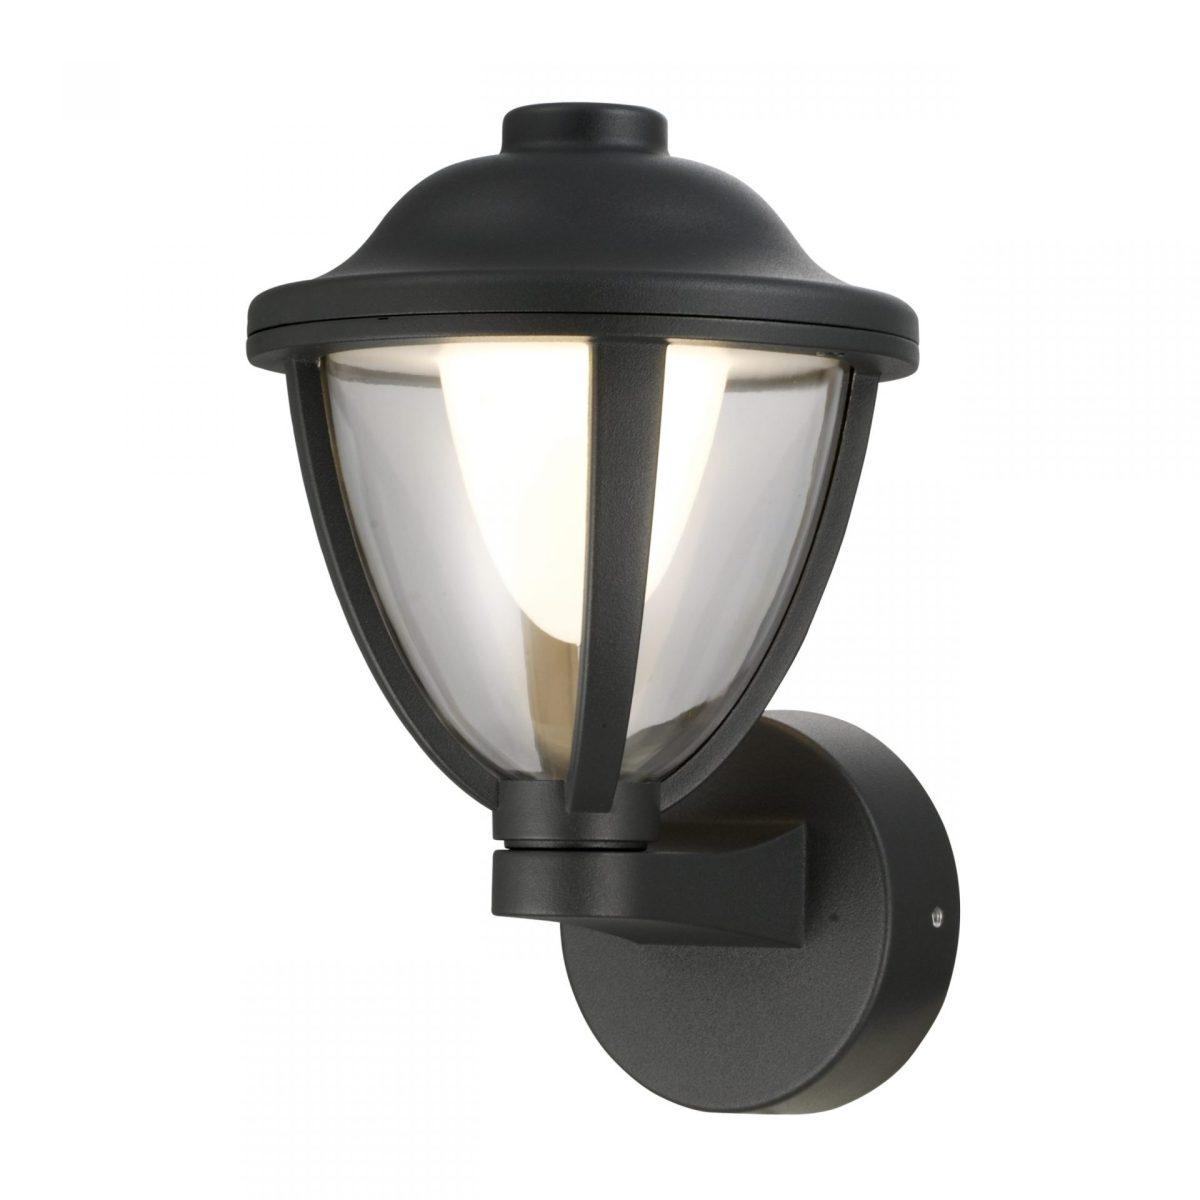 Outdoor Lighting Bulkheads WL-L20 – COMING SOON